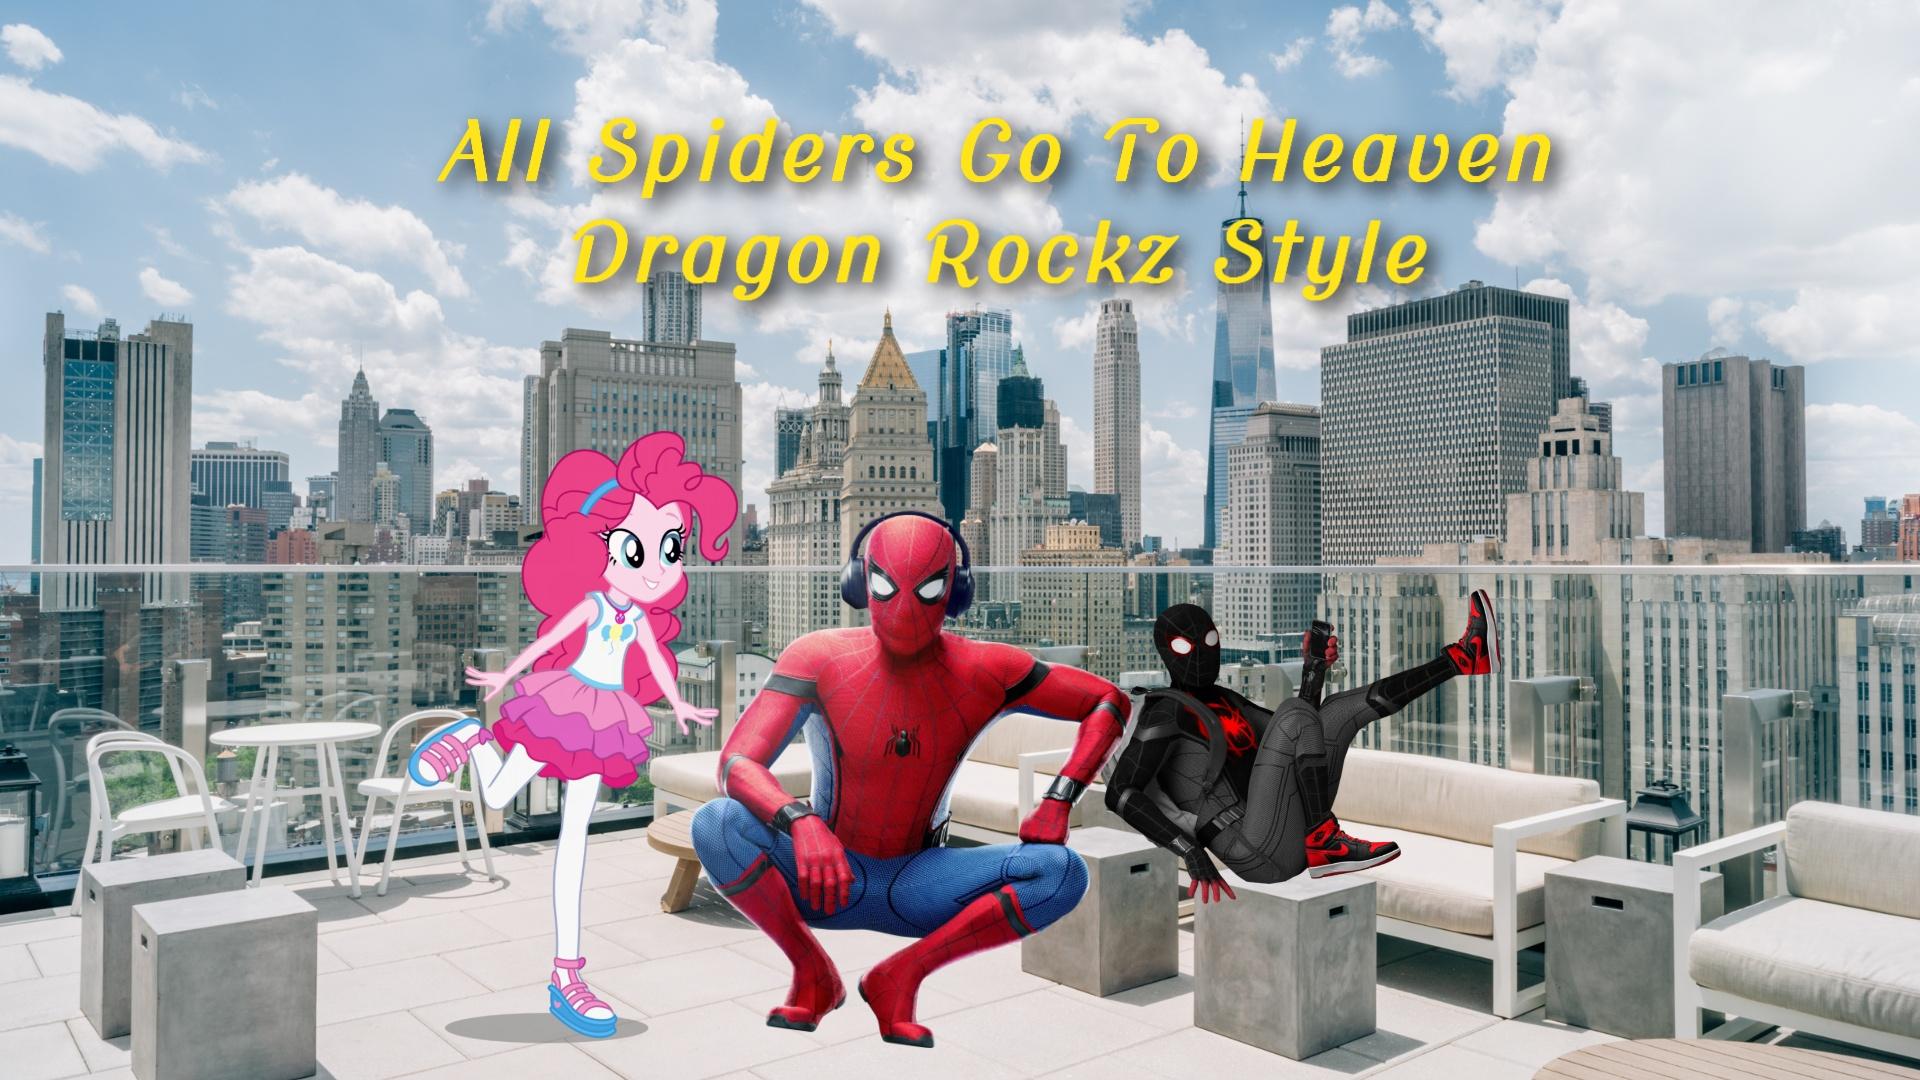 All Spiders Go To Heaven (Dragon Rockz Style)